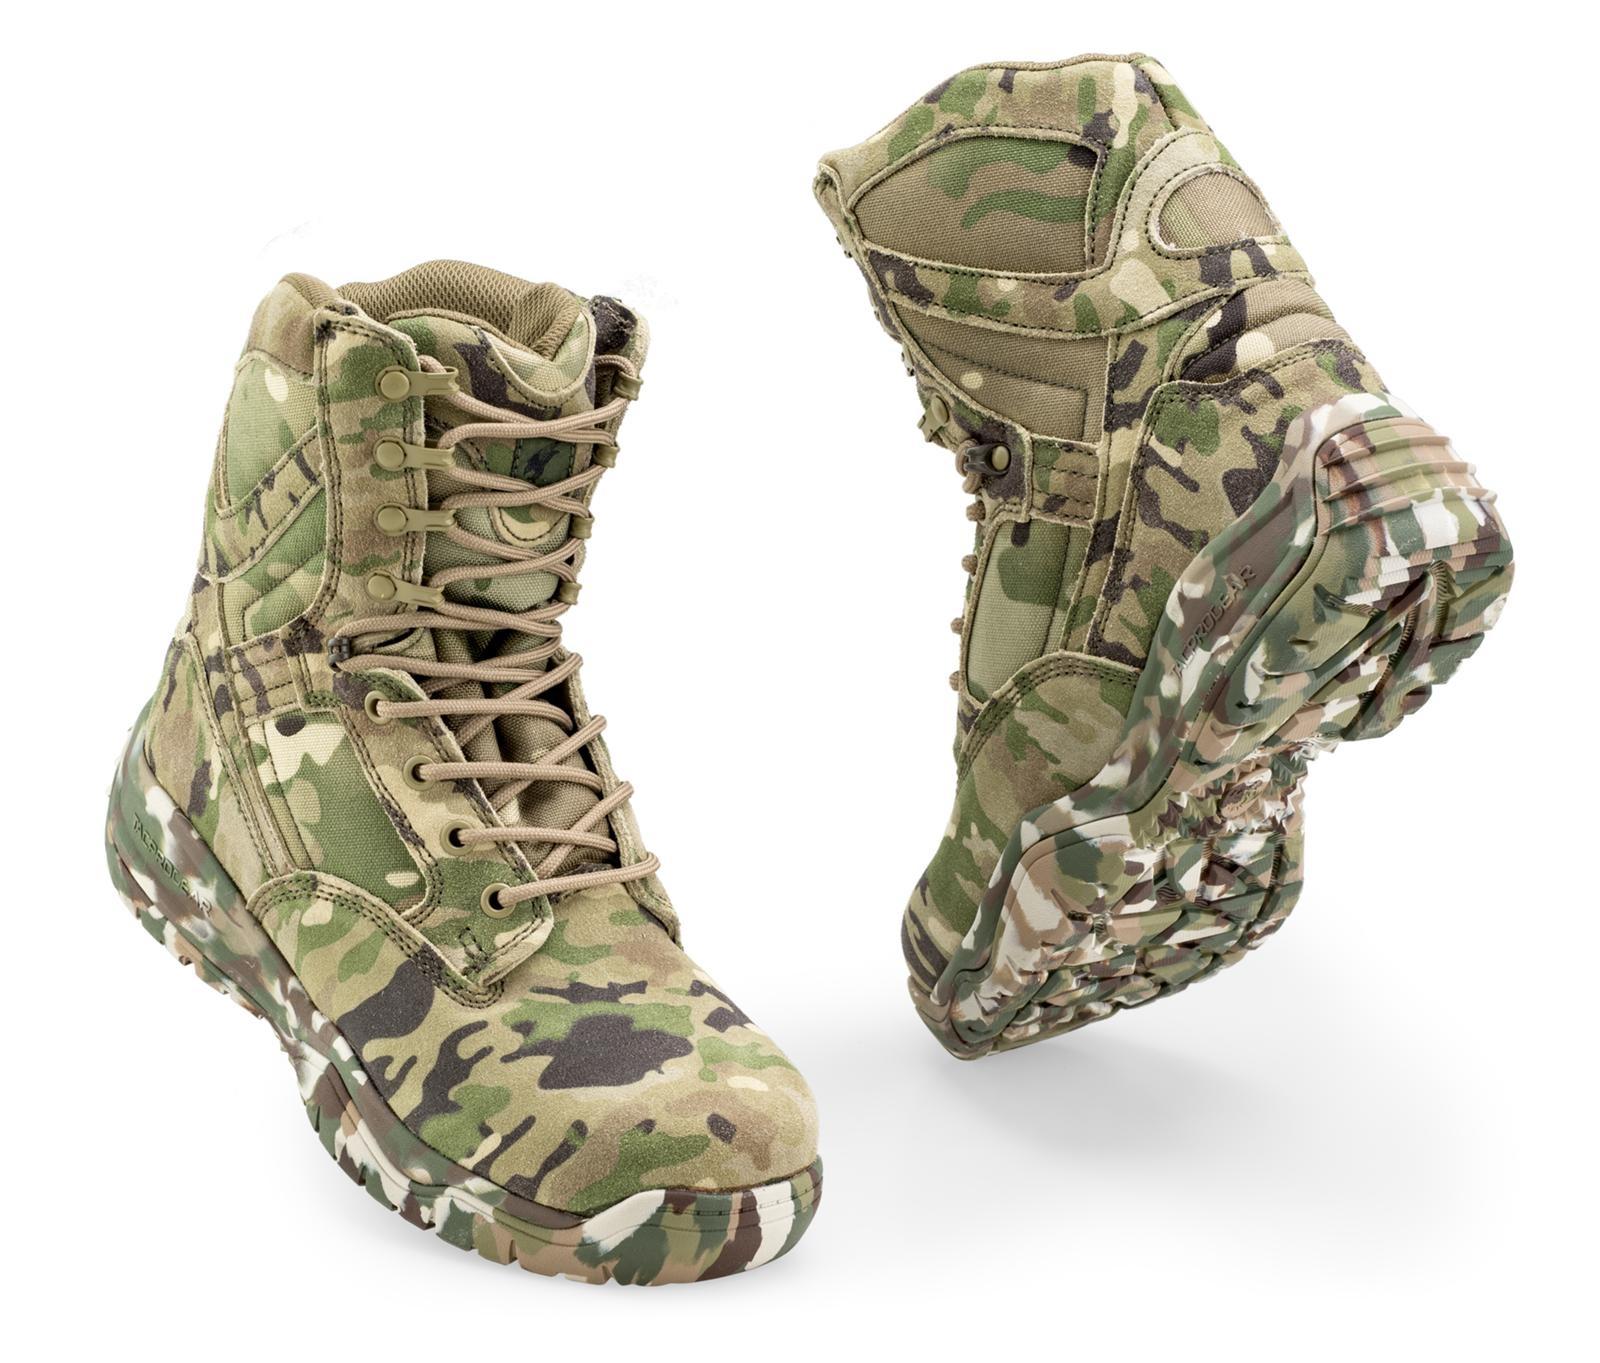 DEFCON5 Tactical Approach Boots - MultiCam